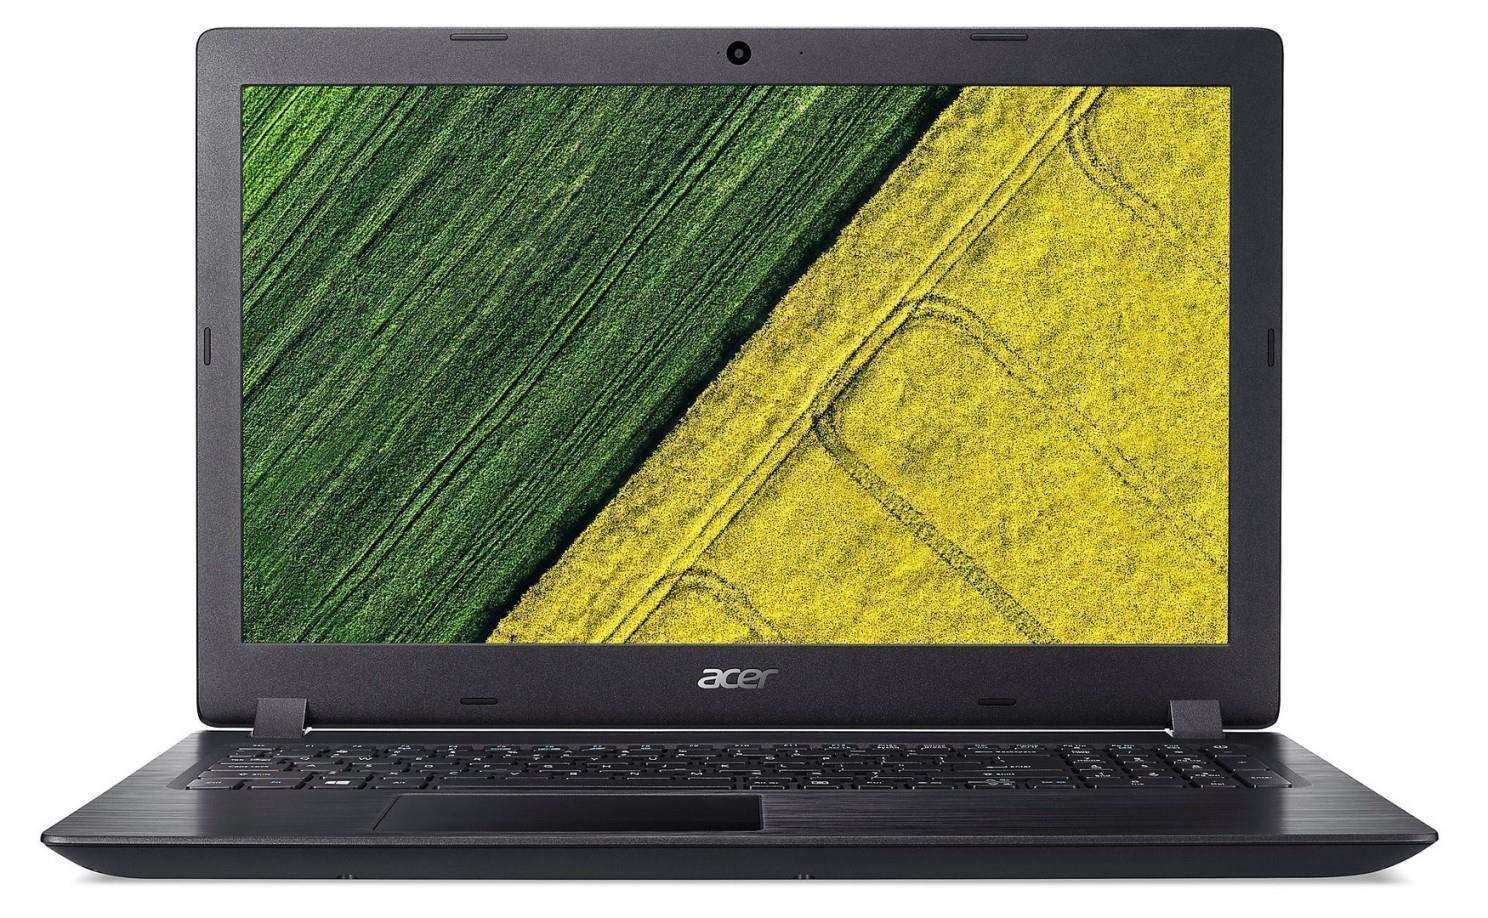 Acer-Aspire-3-156-FHD-Notebook-Black-AMD-A6-Dual-Core-4GB-RAM-1TB-Storage-Windows-10-Home